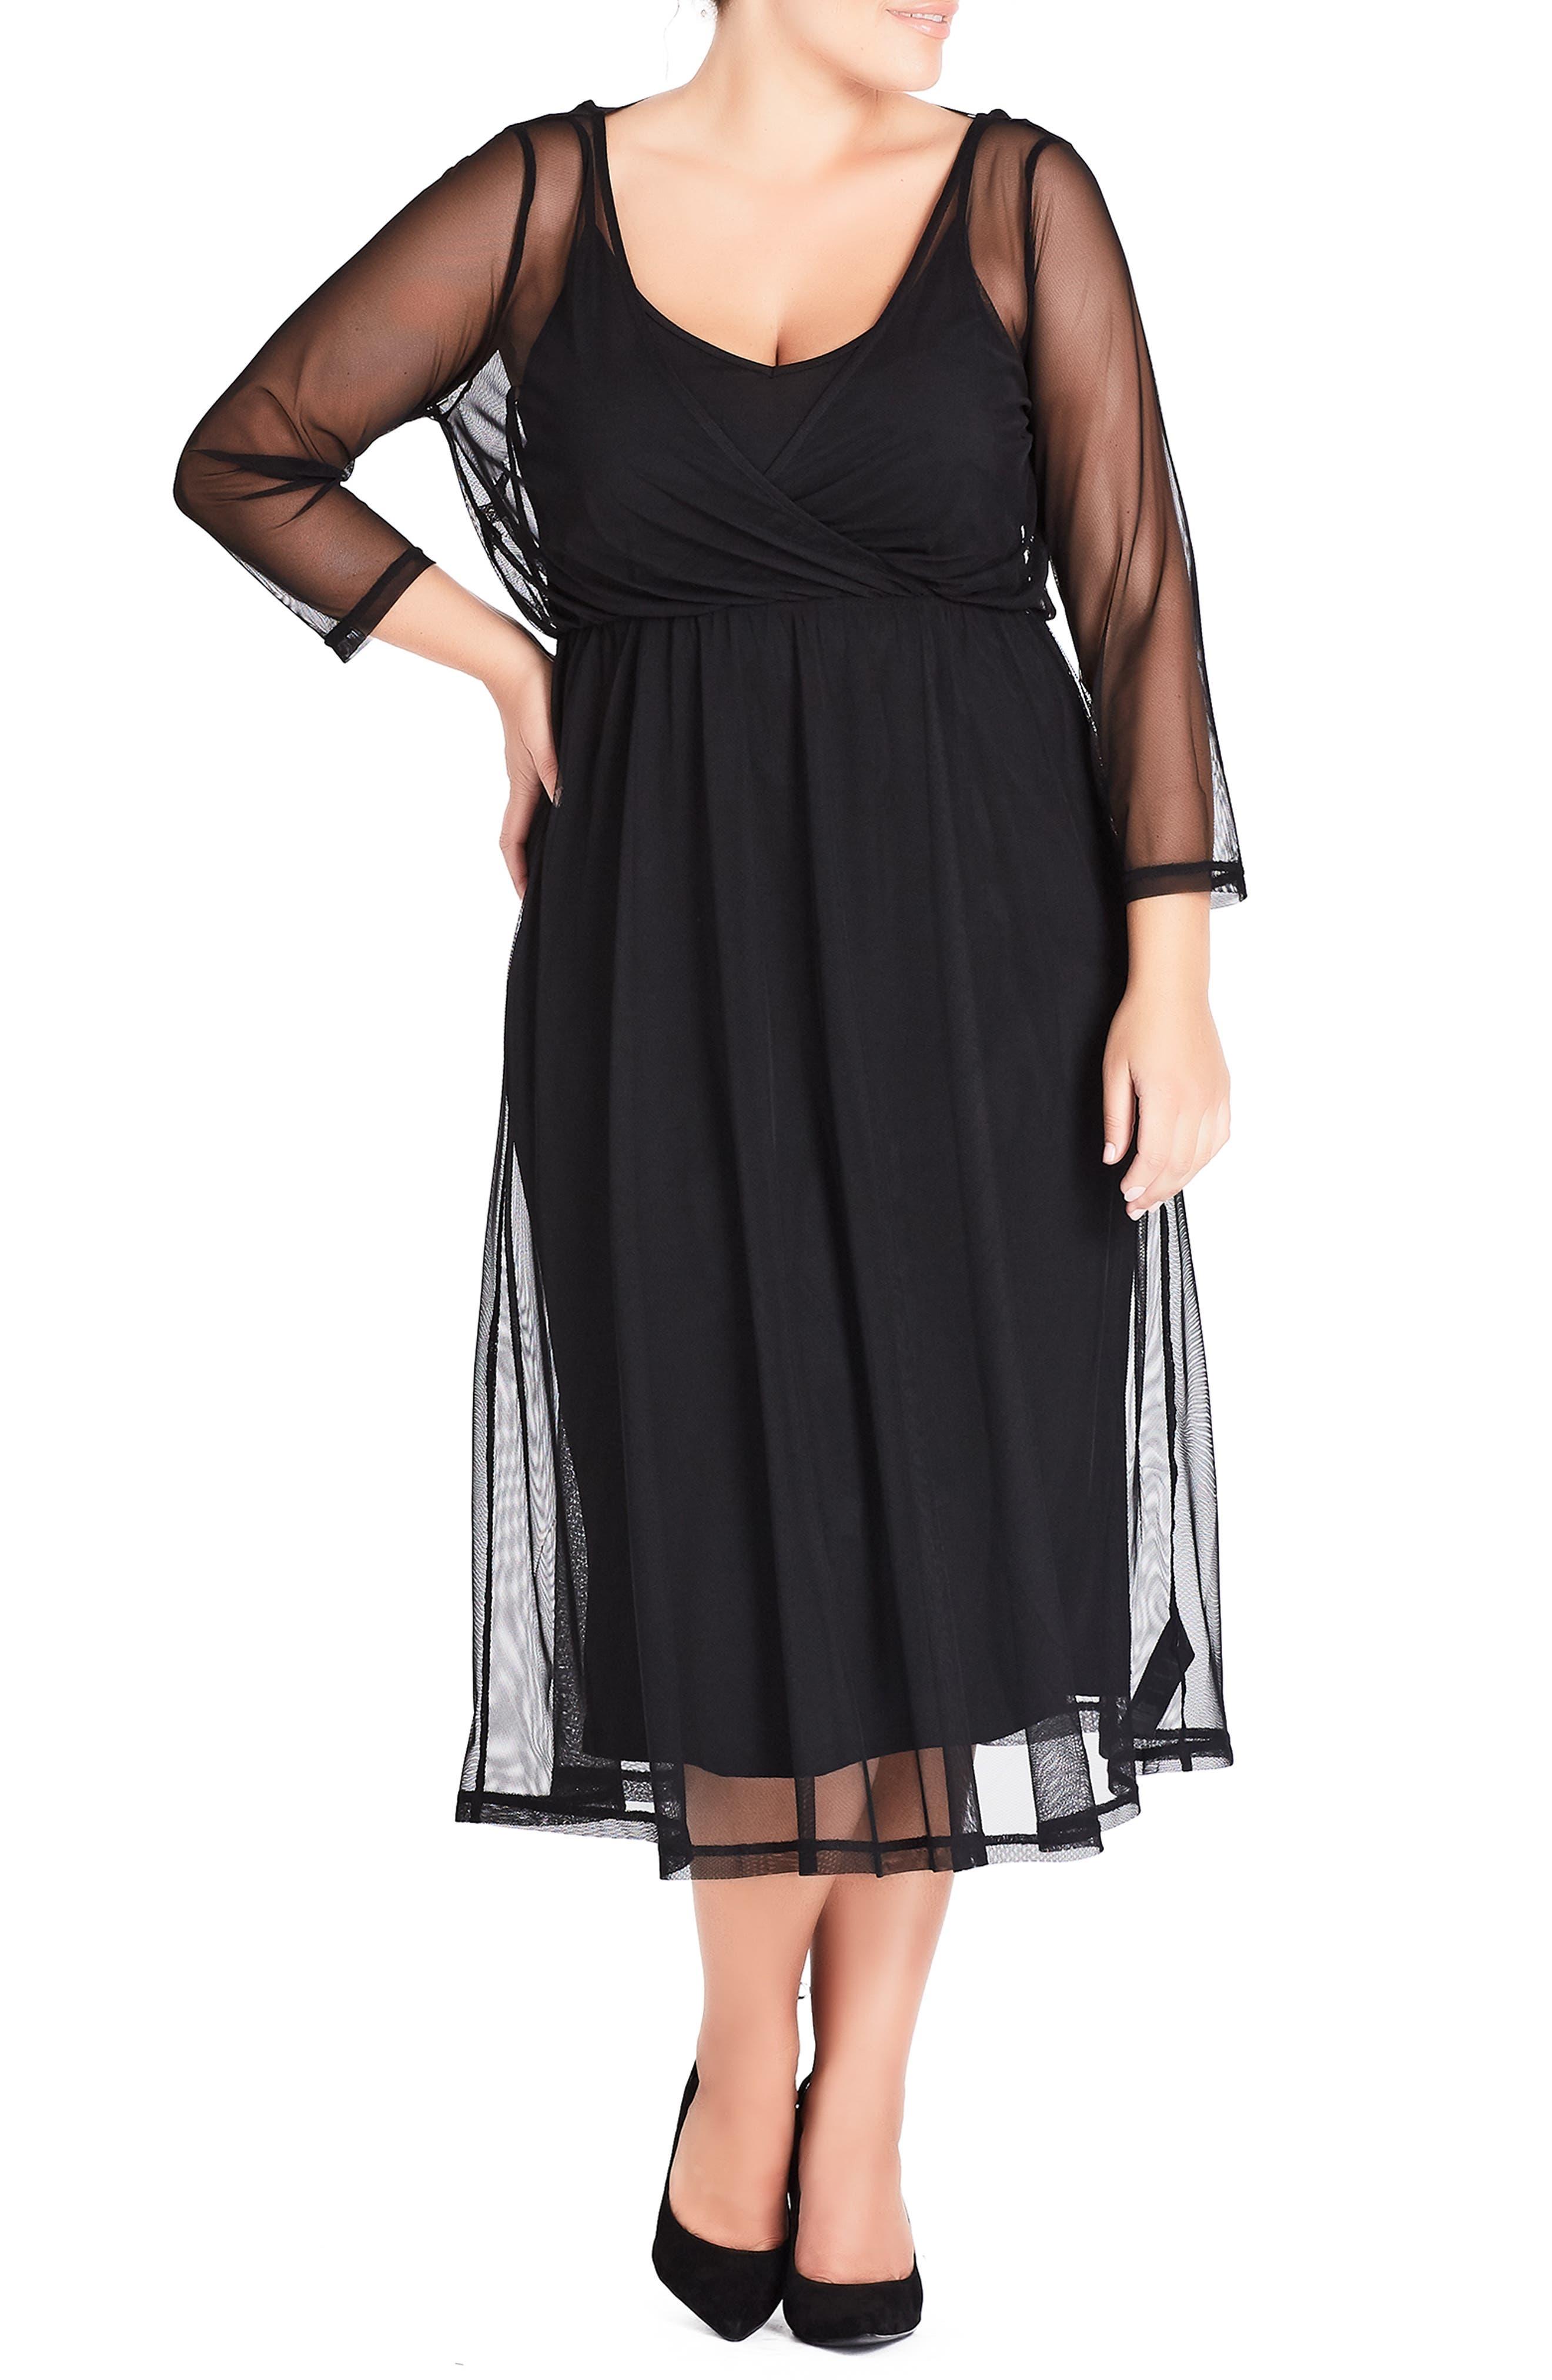 Plus Size City Chic Mesh Overlay Dress